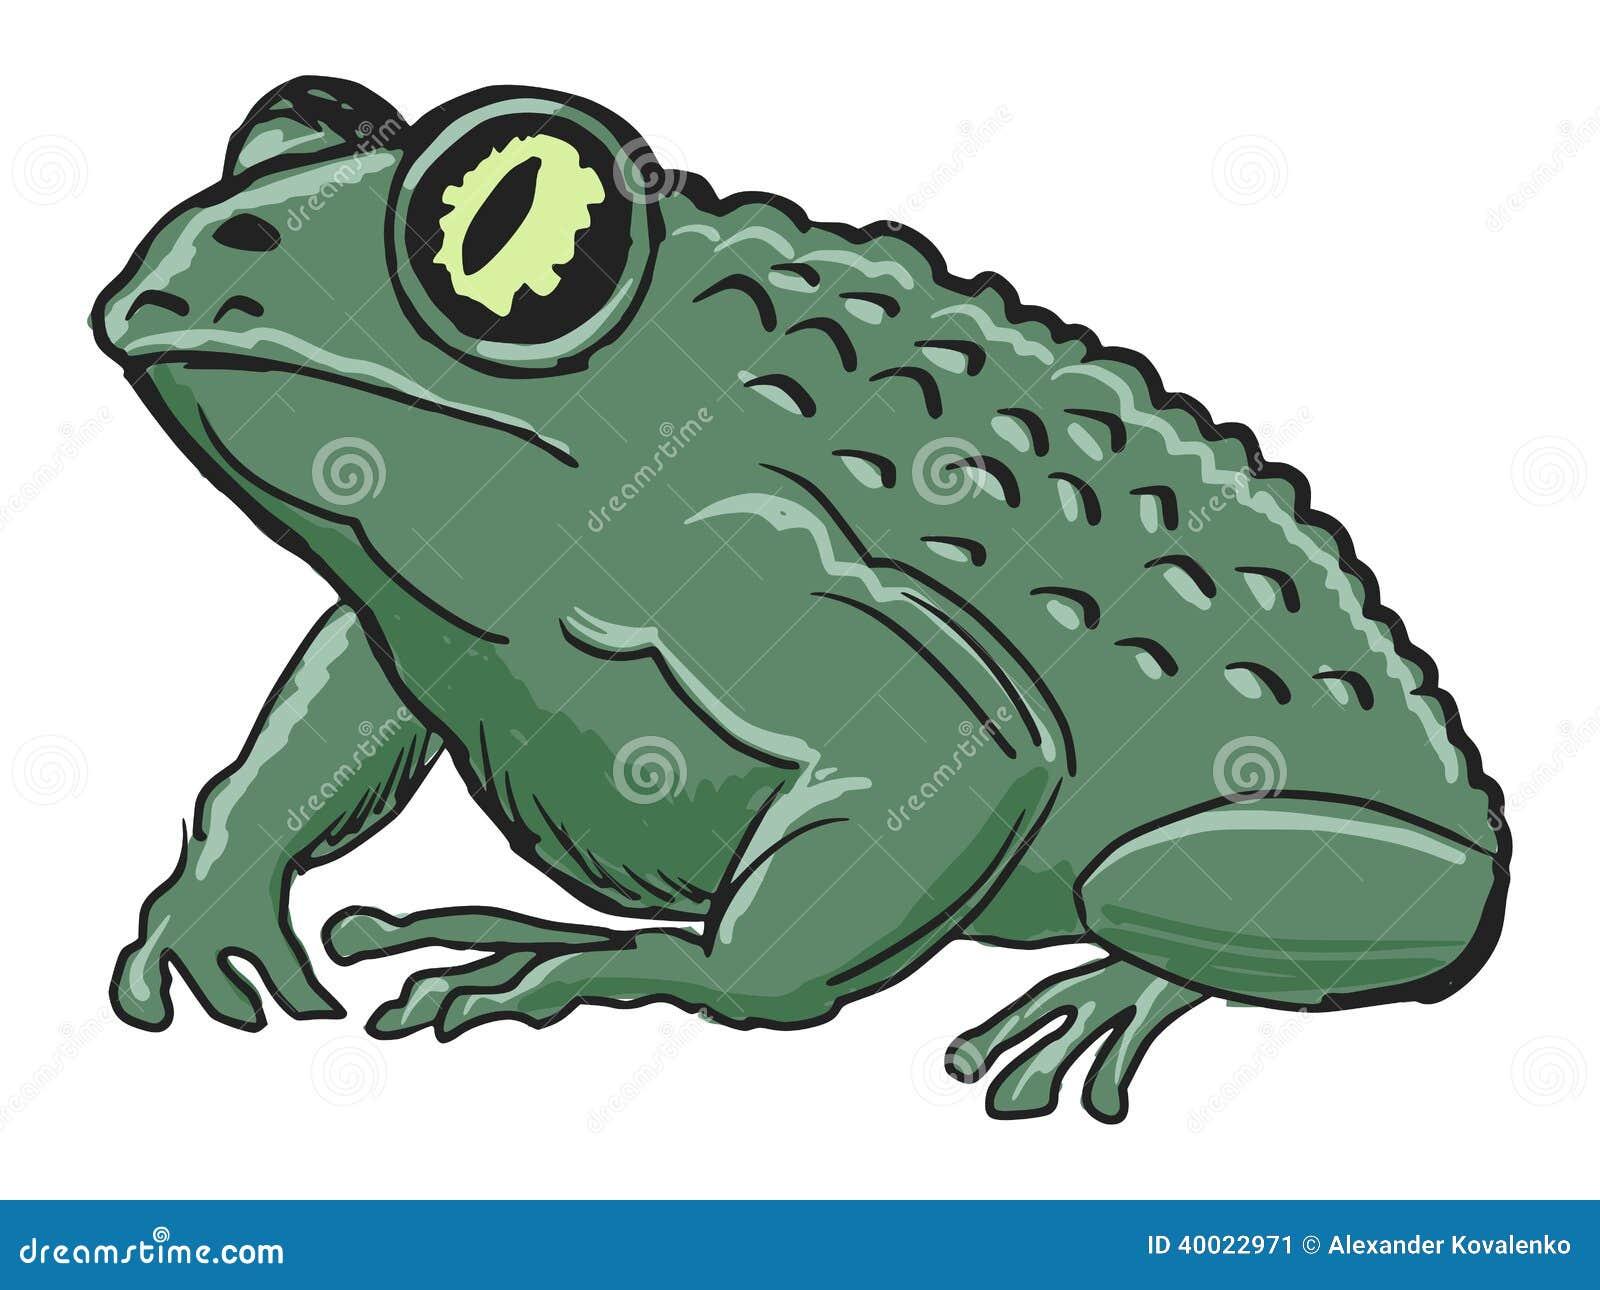 Hand drawn, sketch, cartoon illustration of toad.